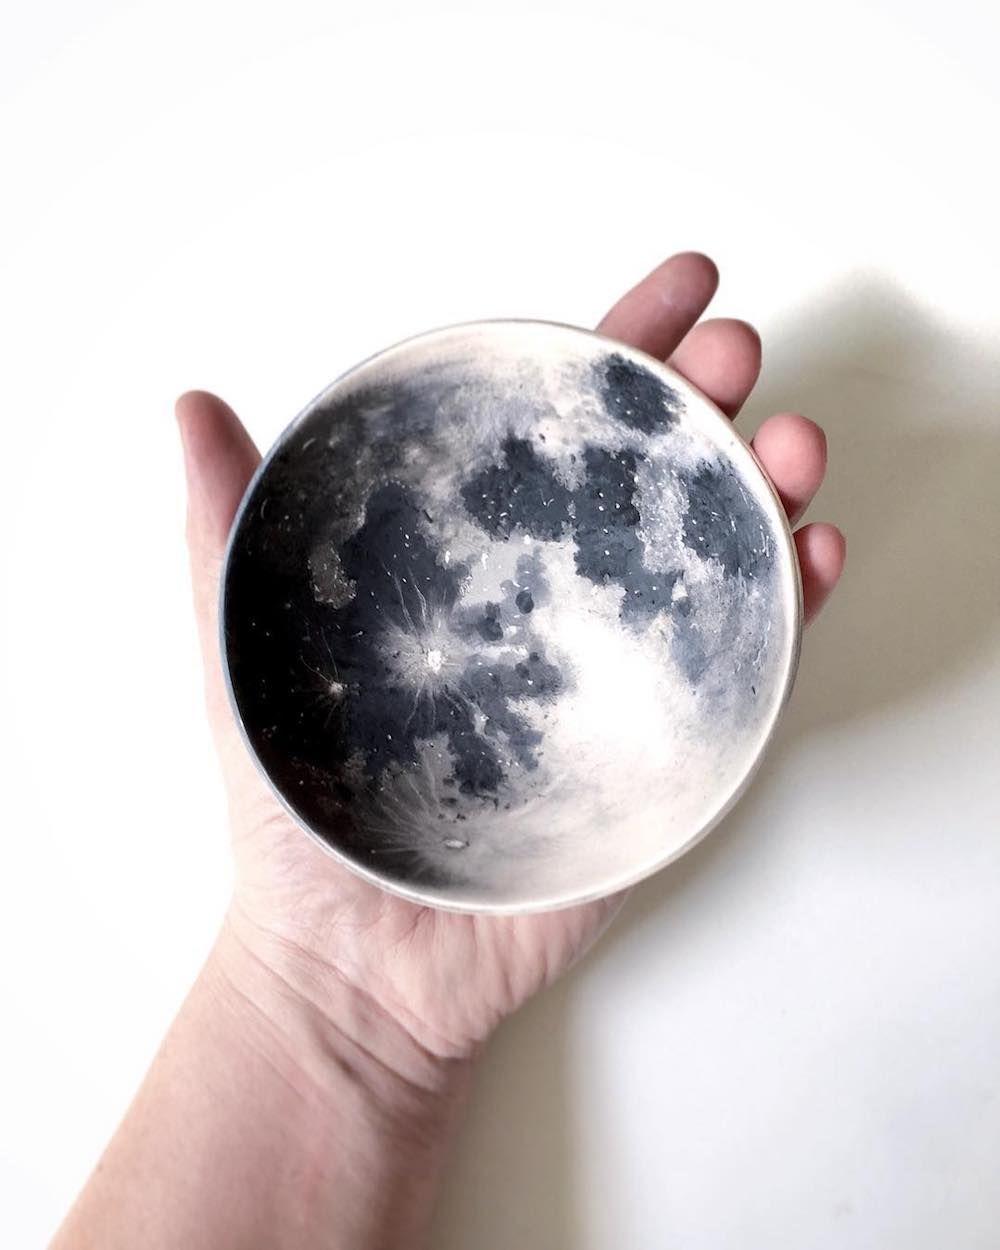 Niharika Hukku: Exquisite handbemalte Keramik zum Thema Himmelswolken und Seefisch #potterypaintingdesigns